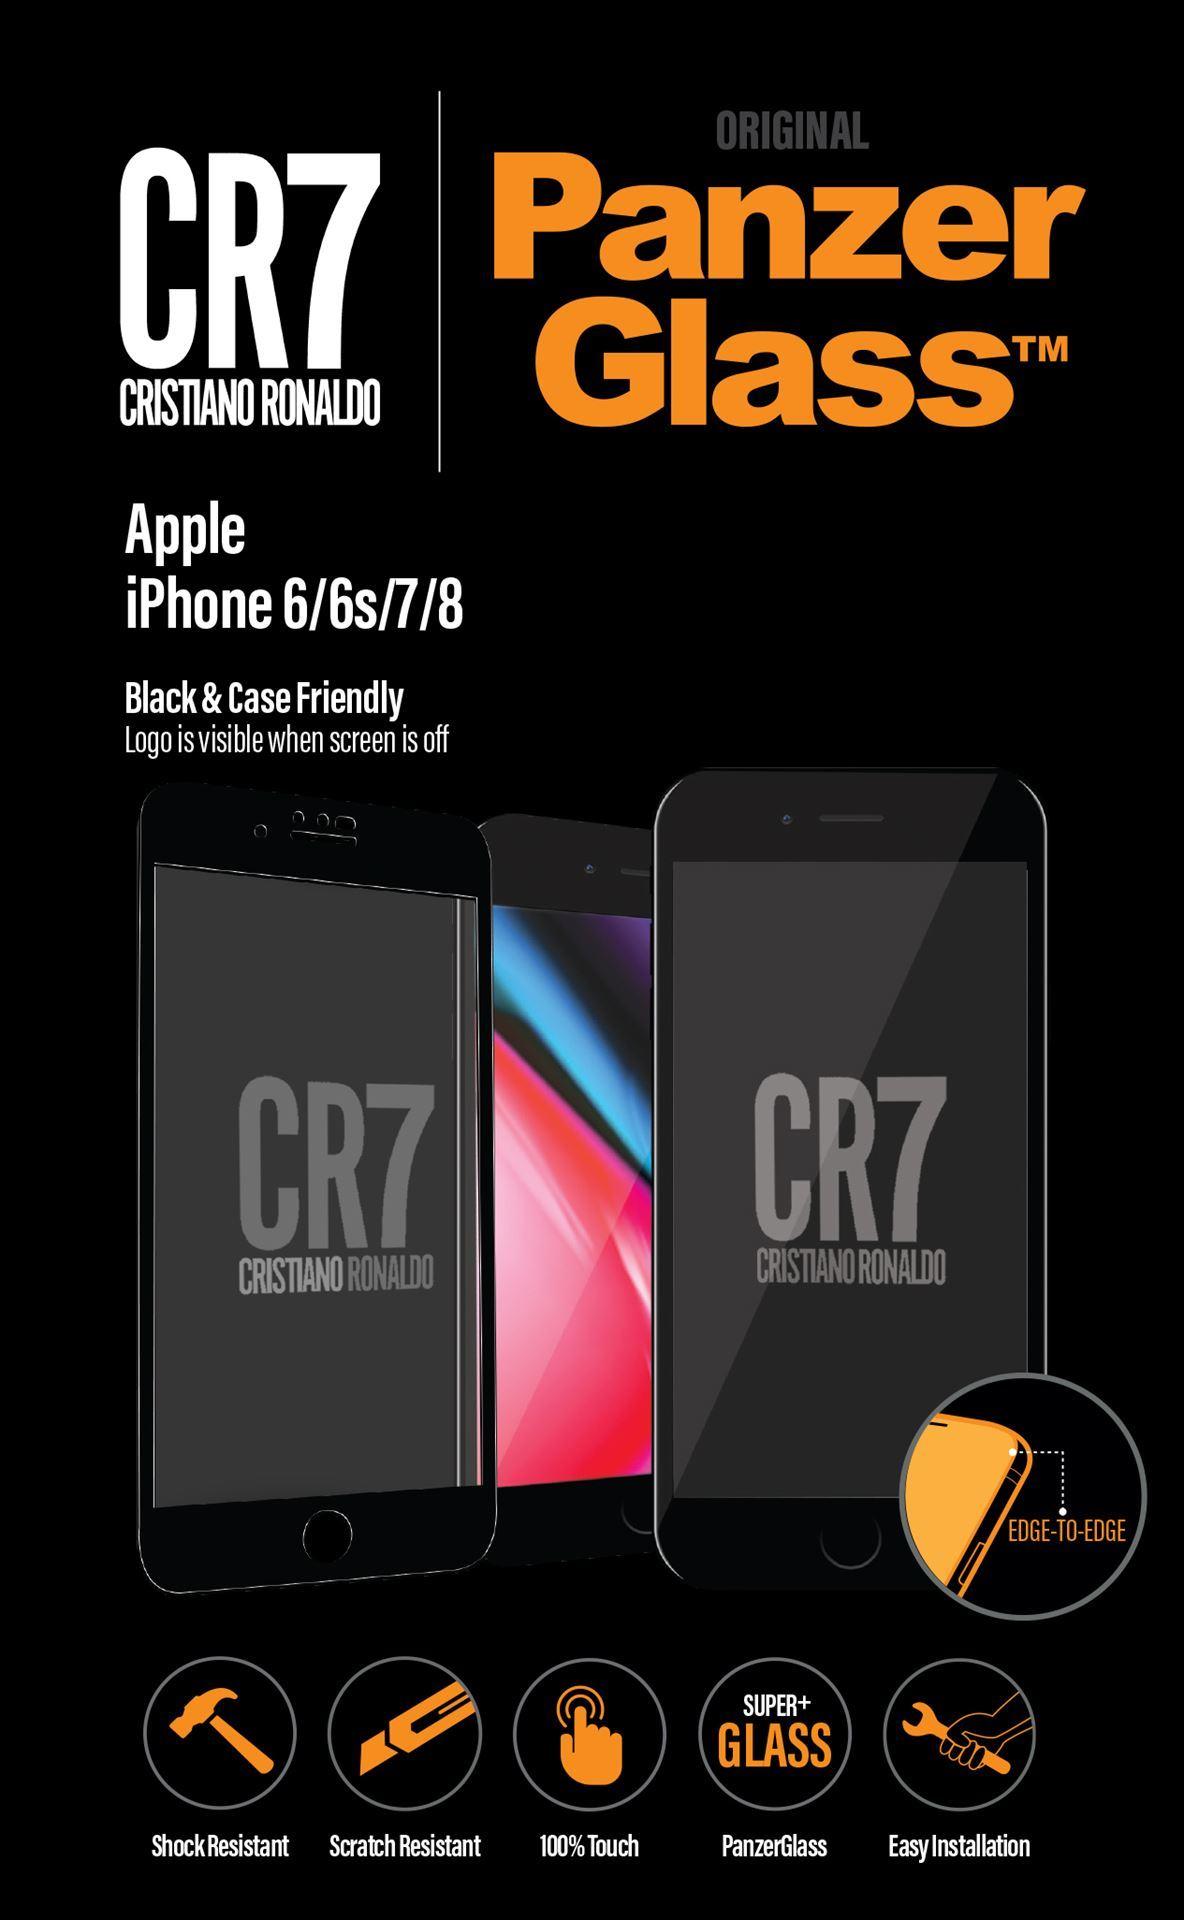 0003498_panzerglass-iphone-66s788-plus-cr7-screen-protector.jpeg